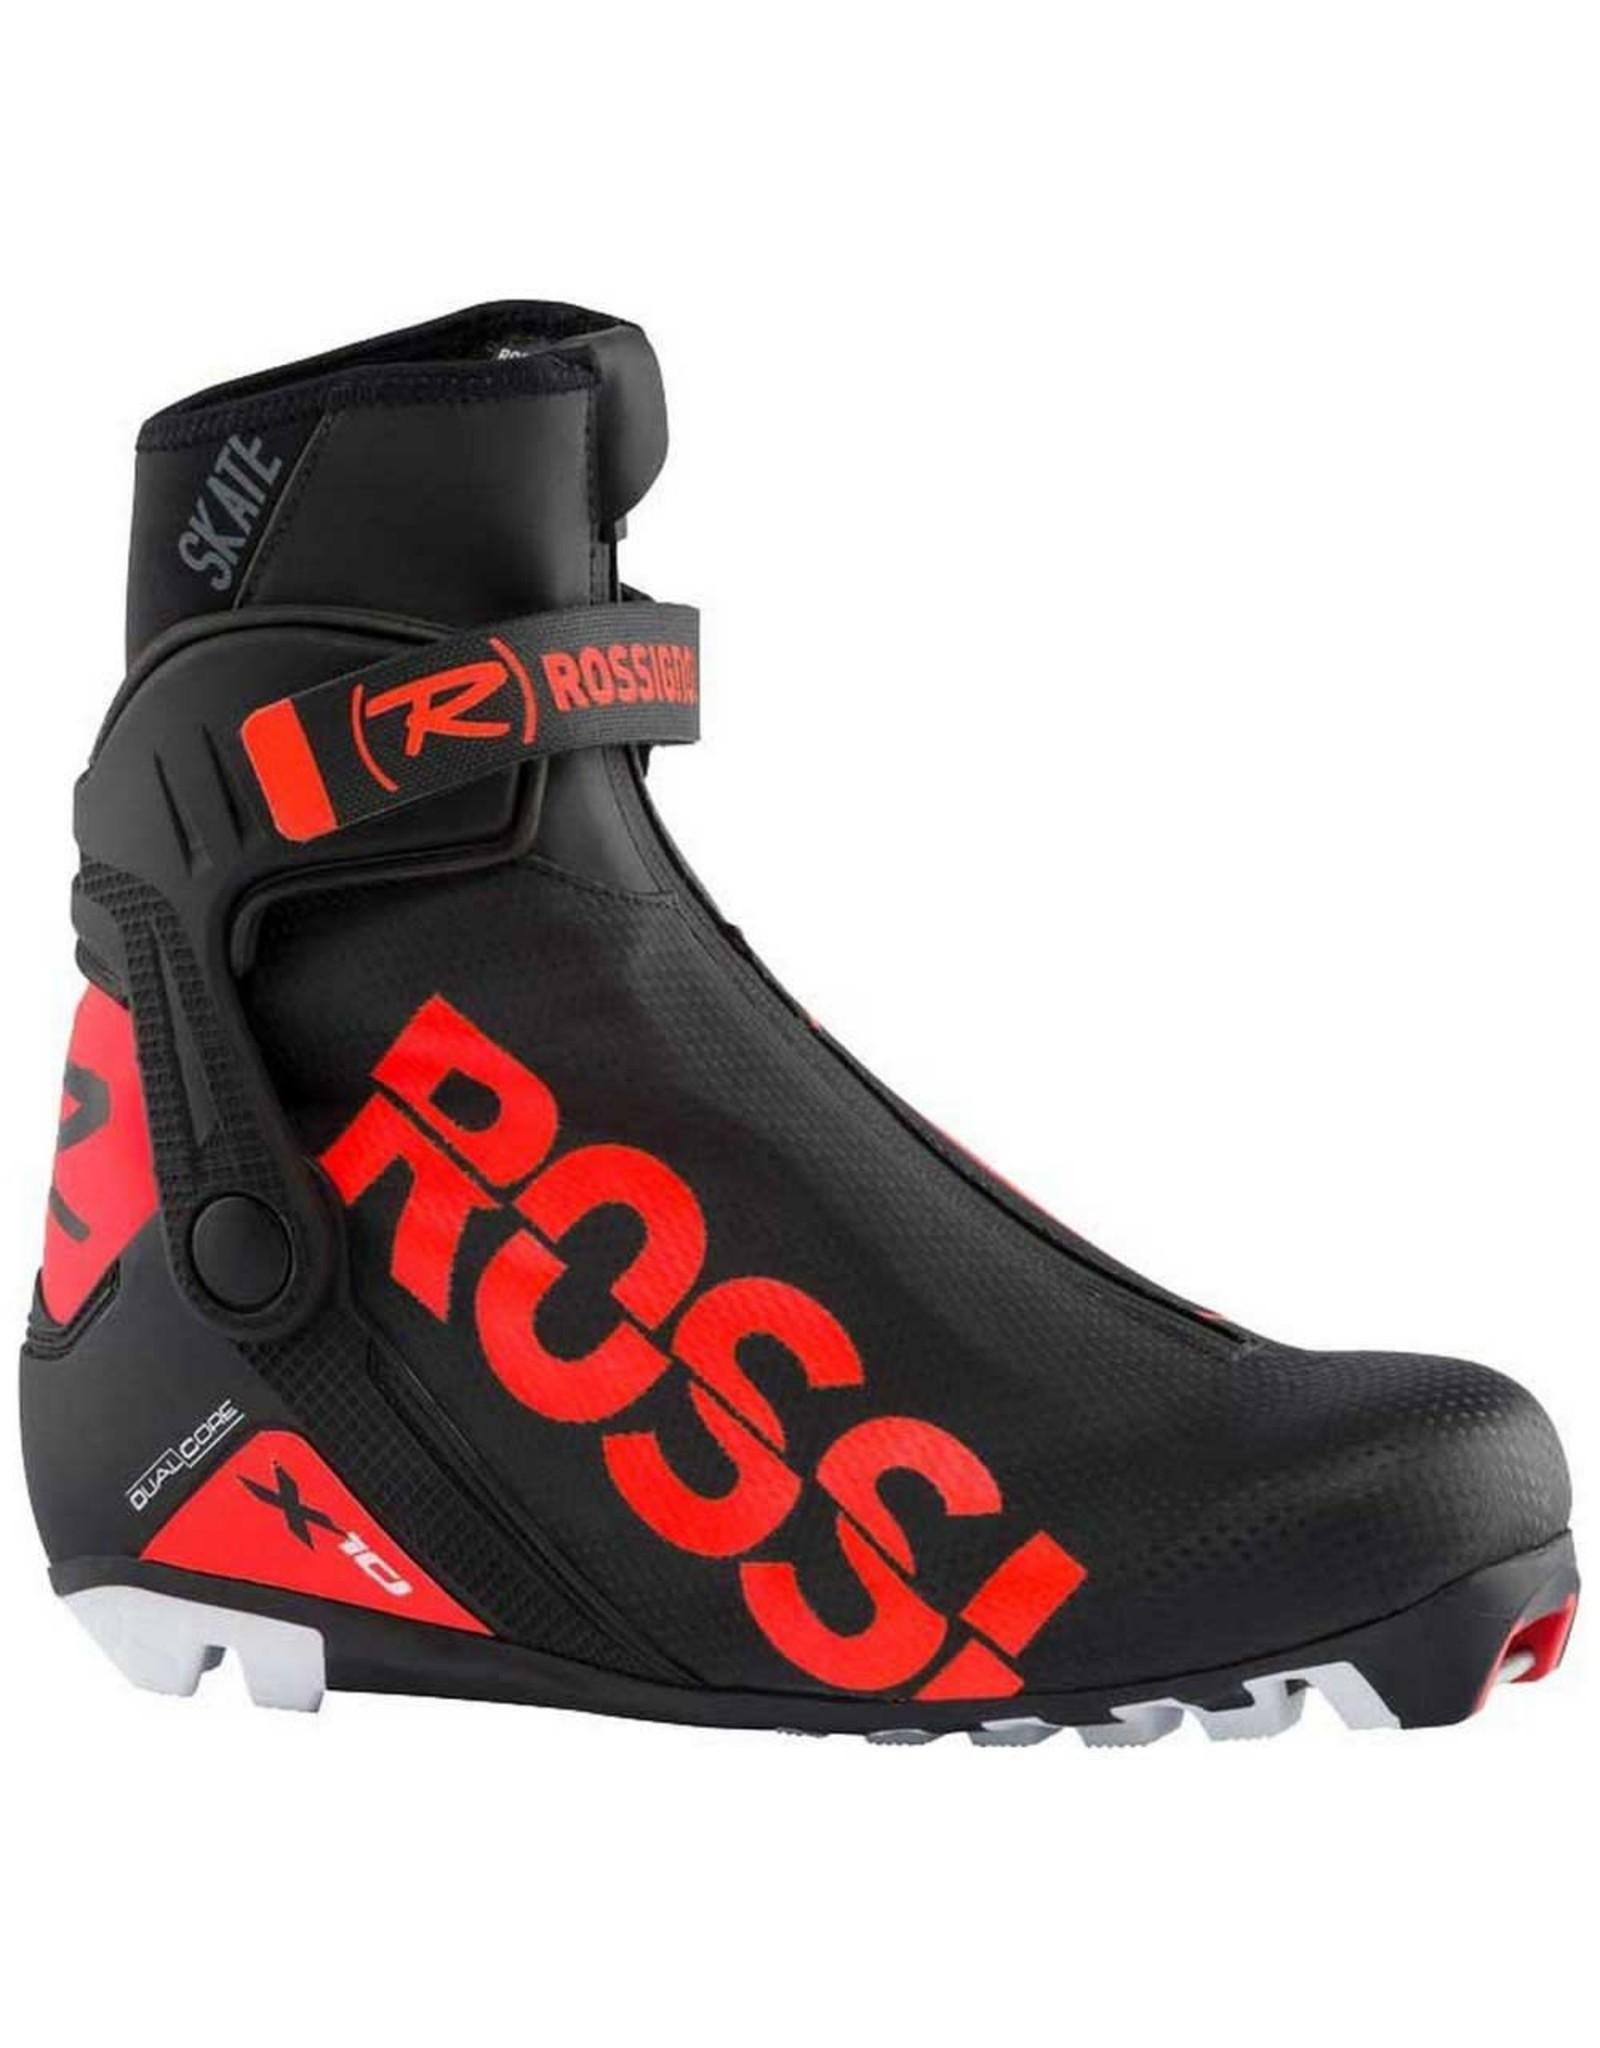 ROSSIGNOL CANADA '20 ROSSIGNOL, Boots, X-10 Sk